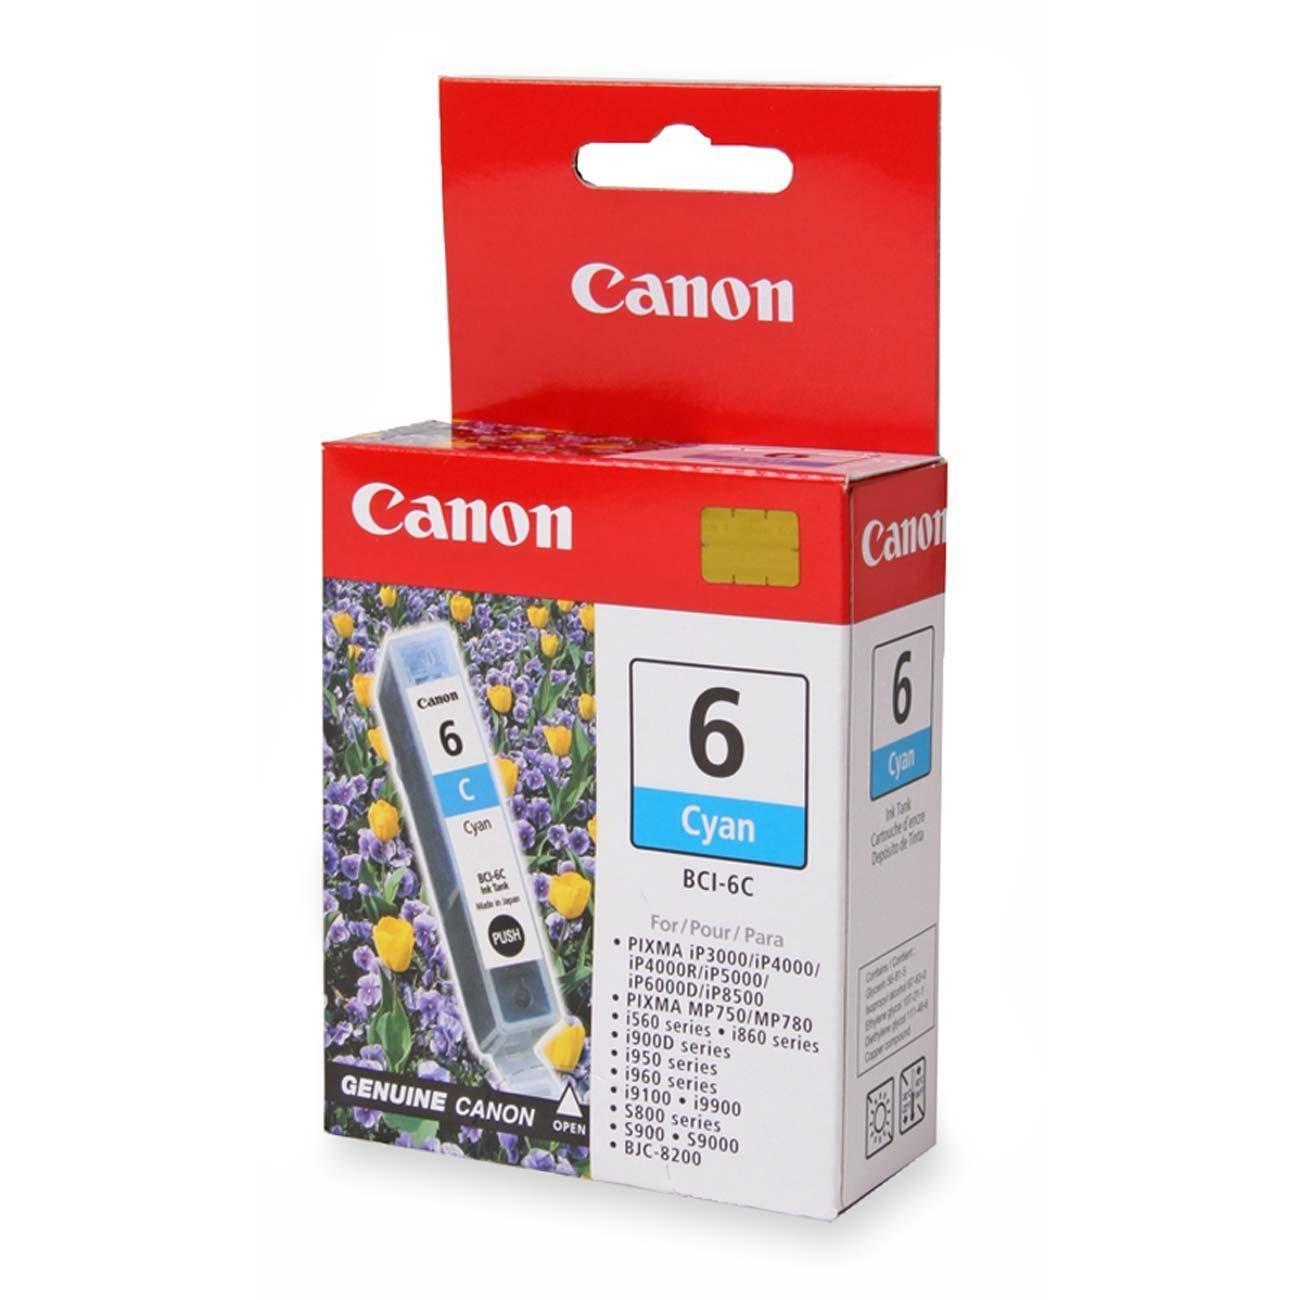 Canon BCI-6C Original Ink Cartridge - Cyan